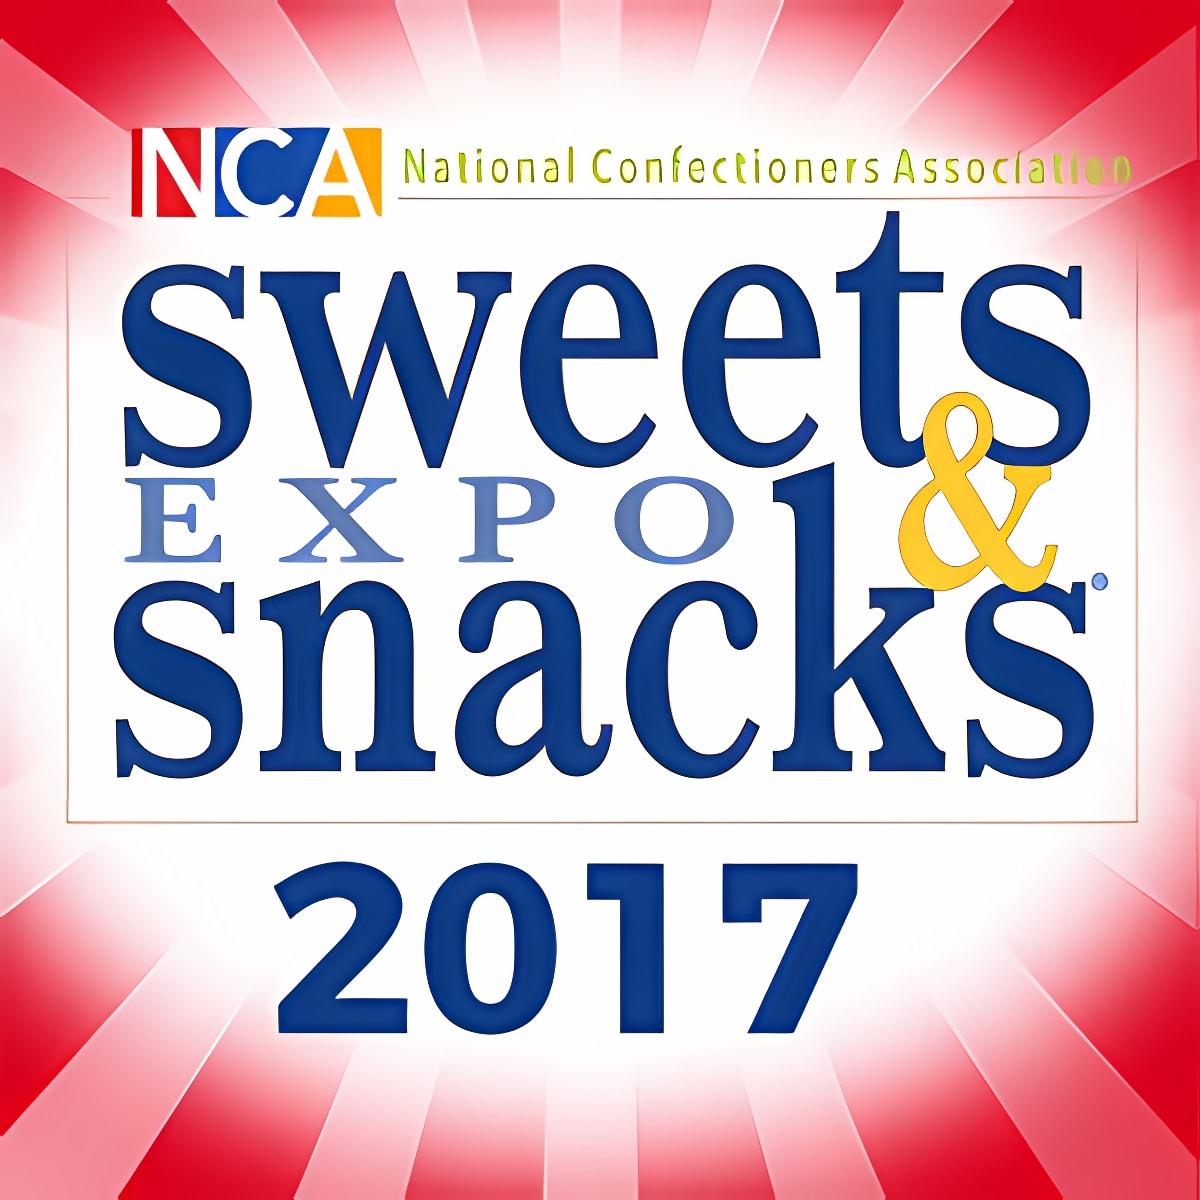 NCA's Sweets & Snacks Expo App